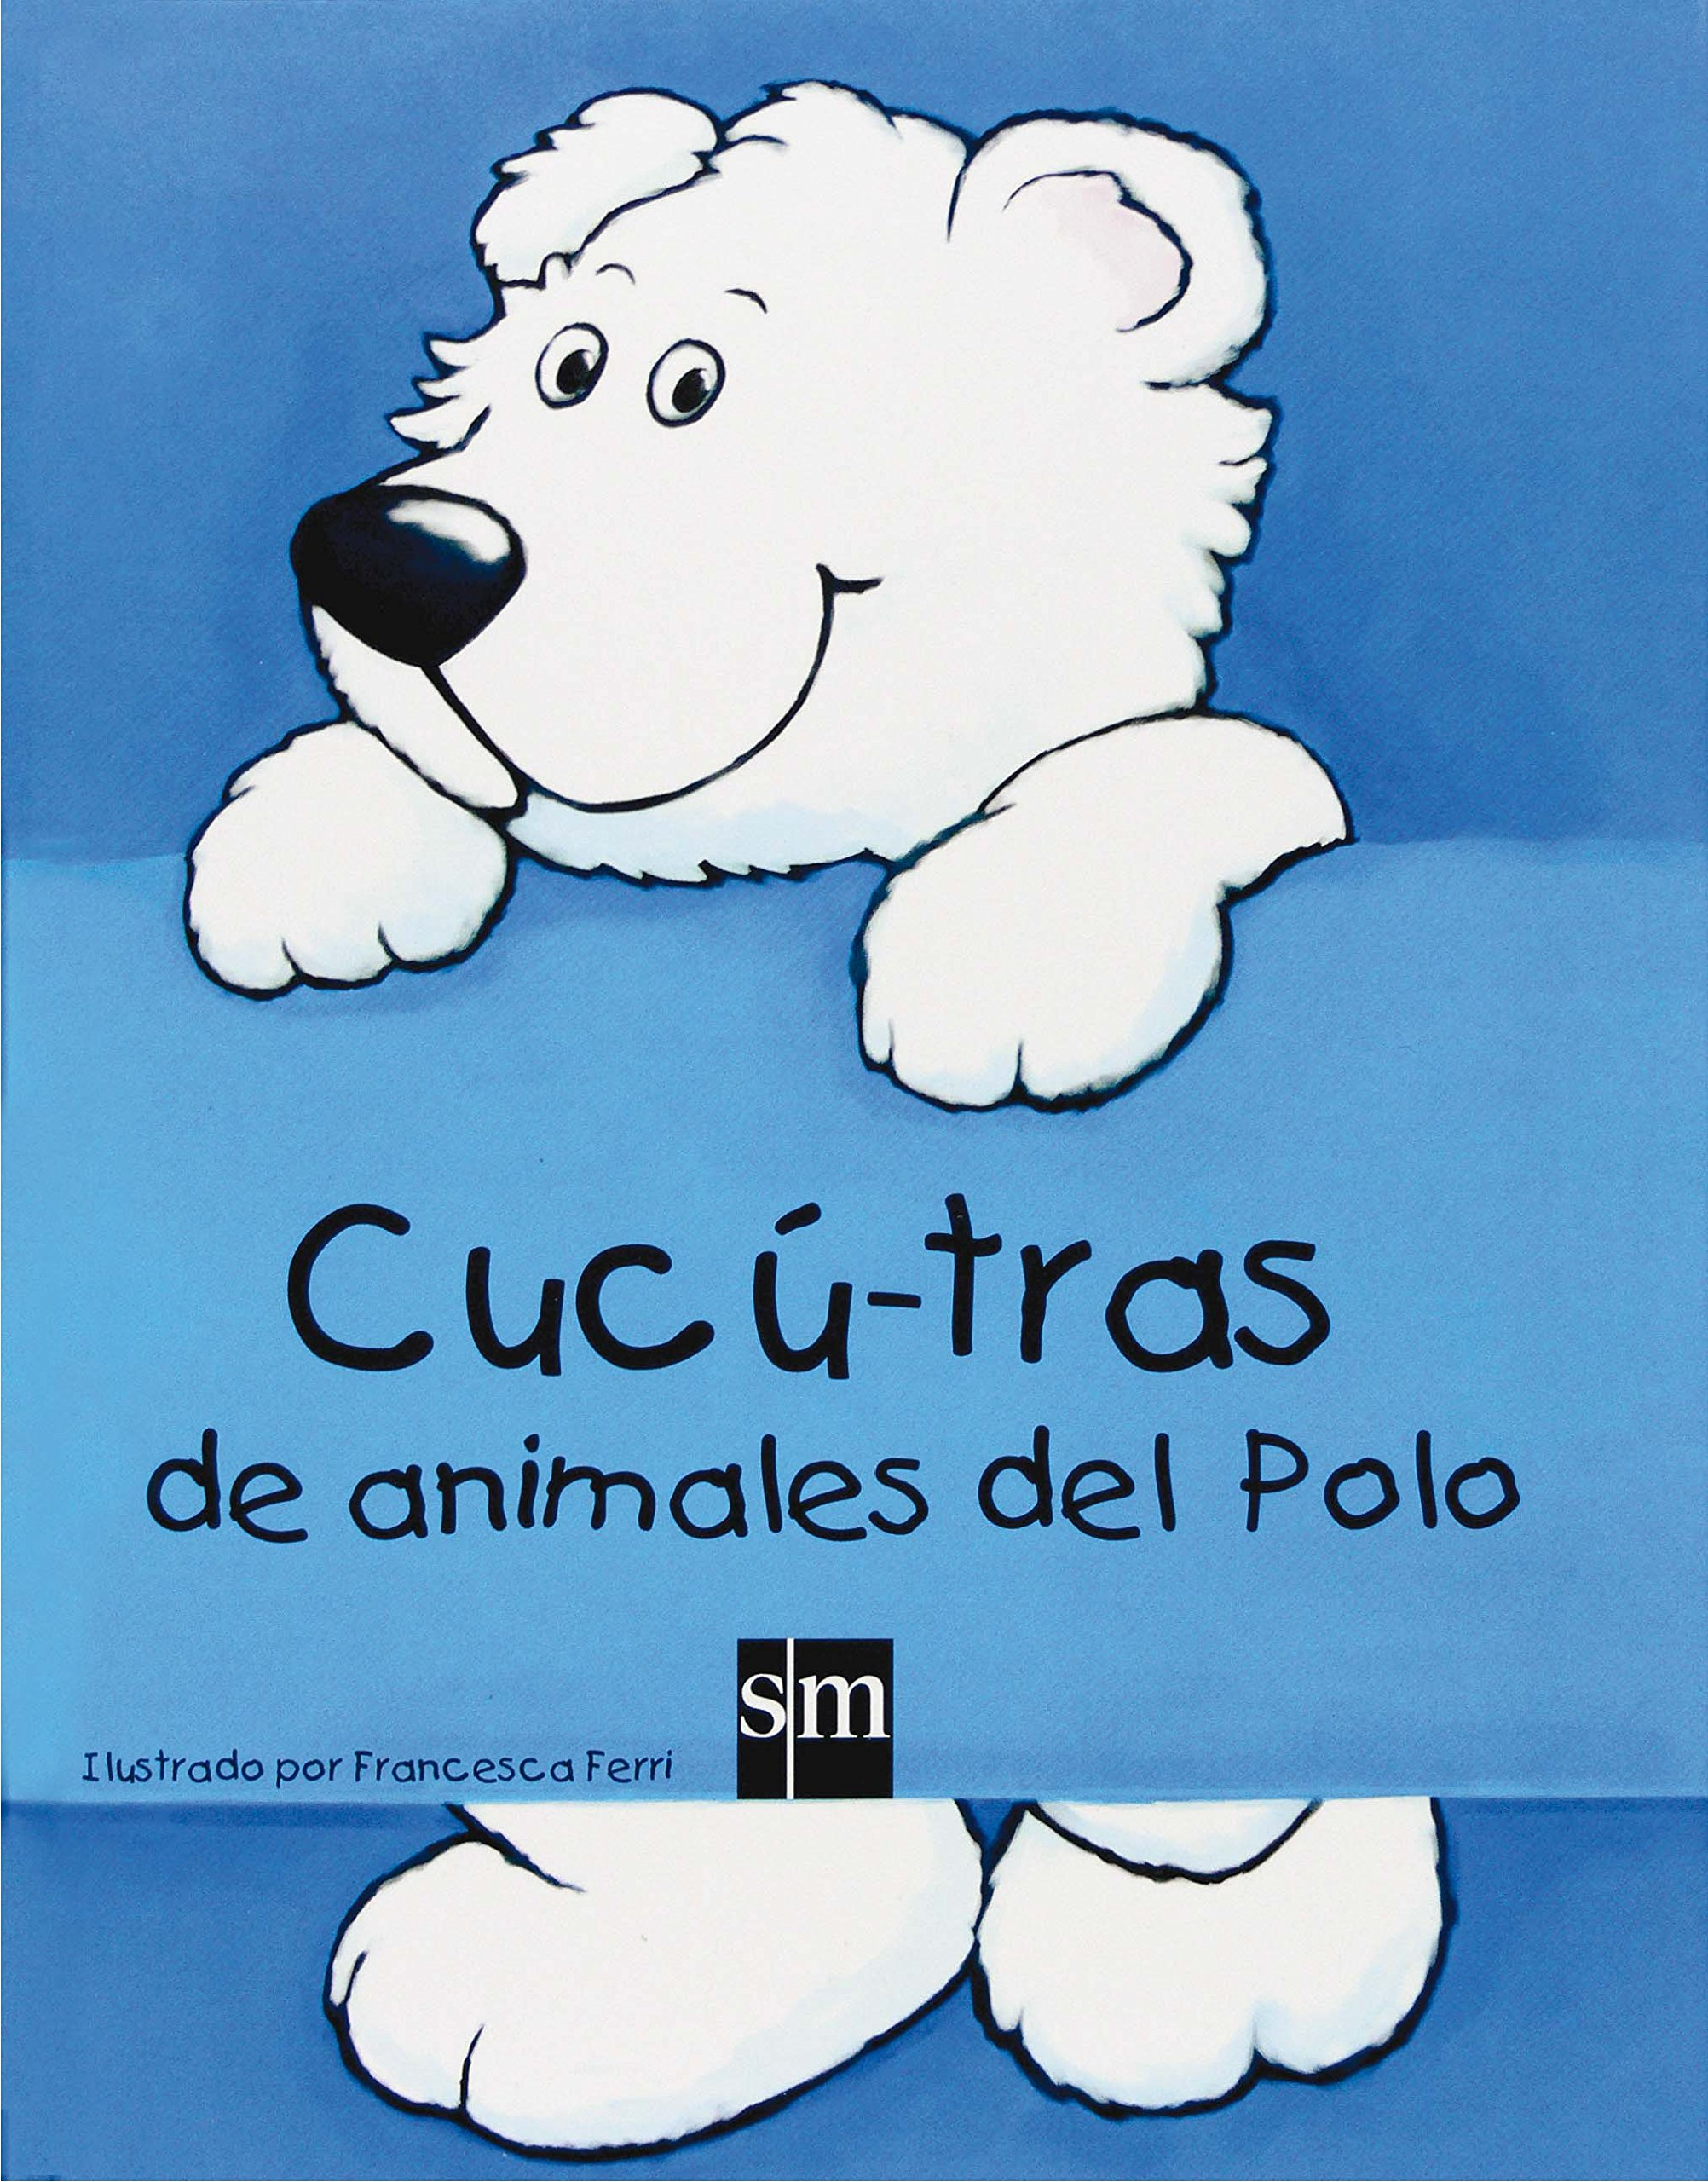 Cucú-tras de animales del Polo: Amazon.es: Ferri, Francesca, Ferri ...